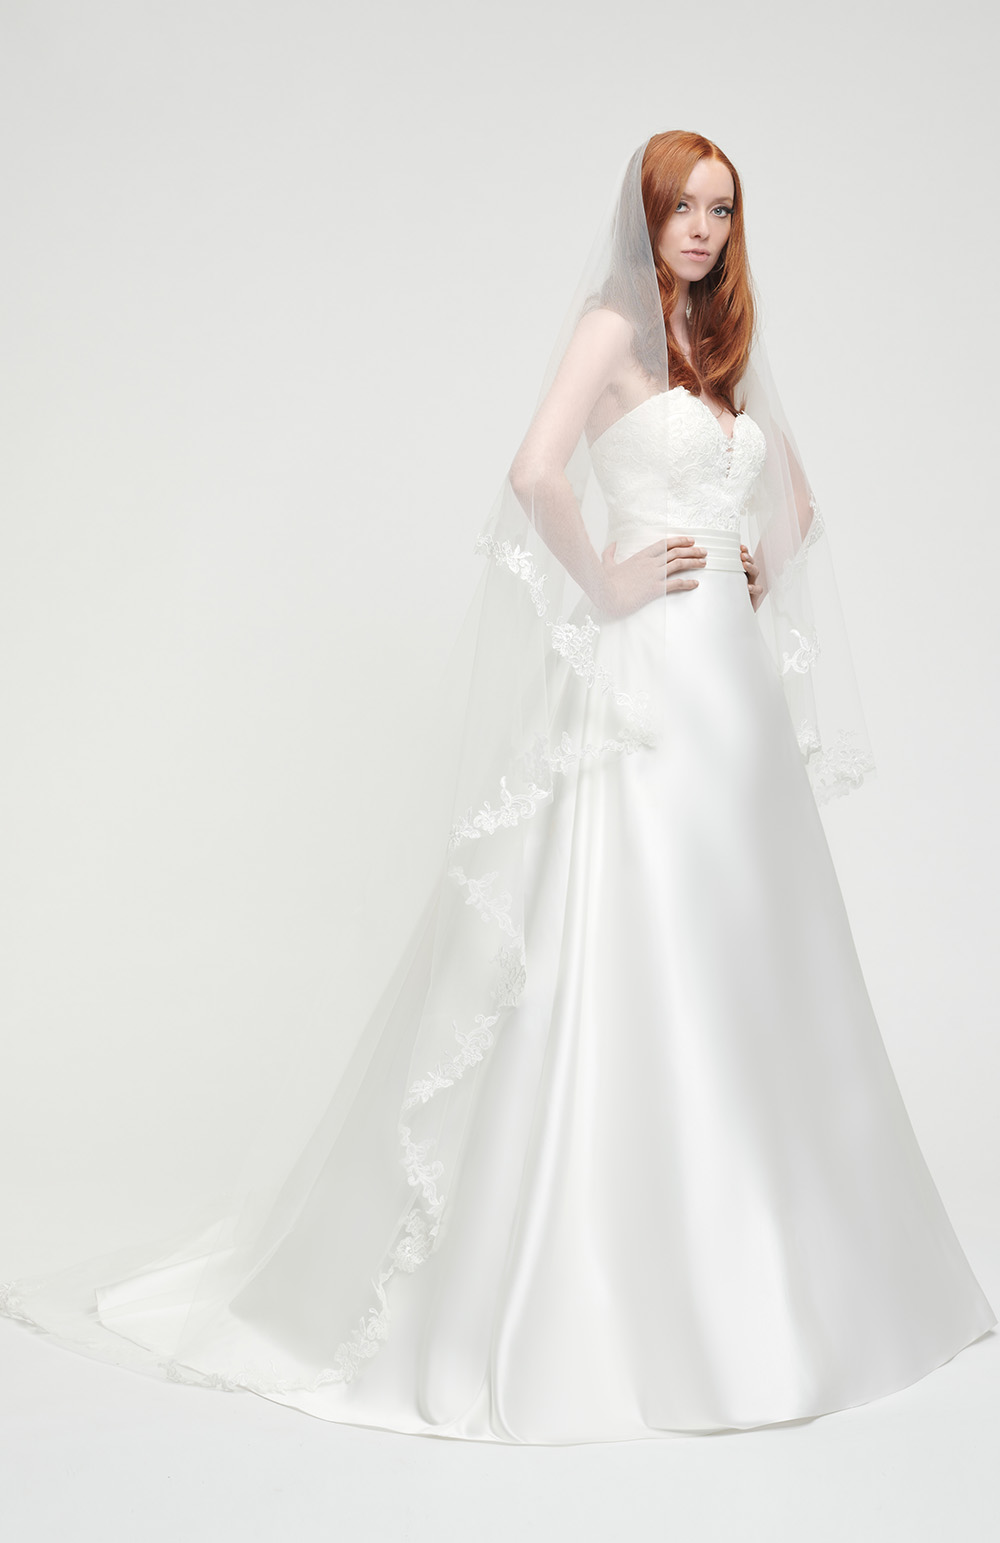 Robe de mariée Modèle Ornella